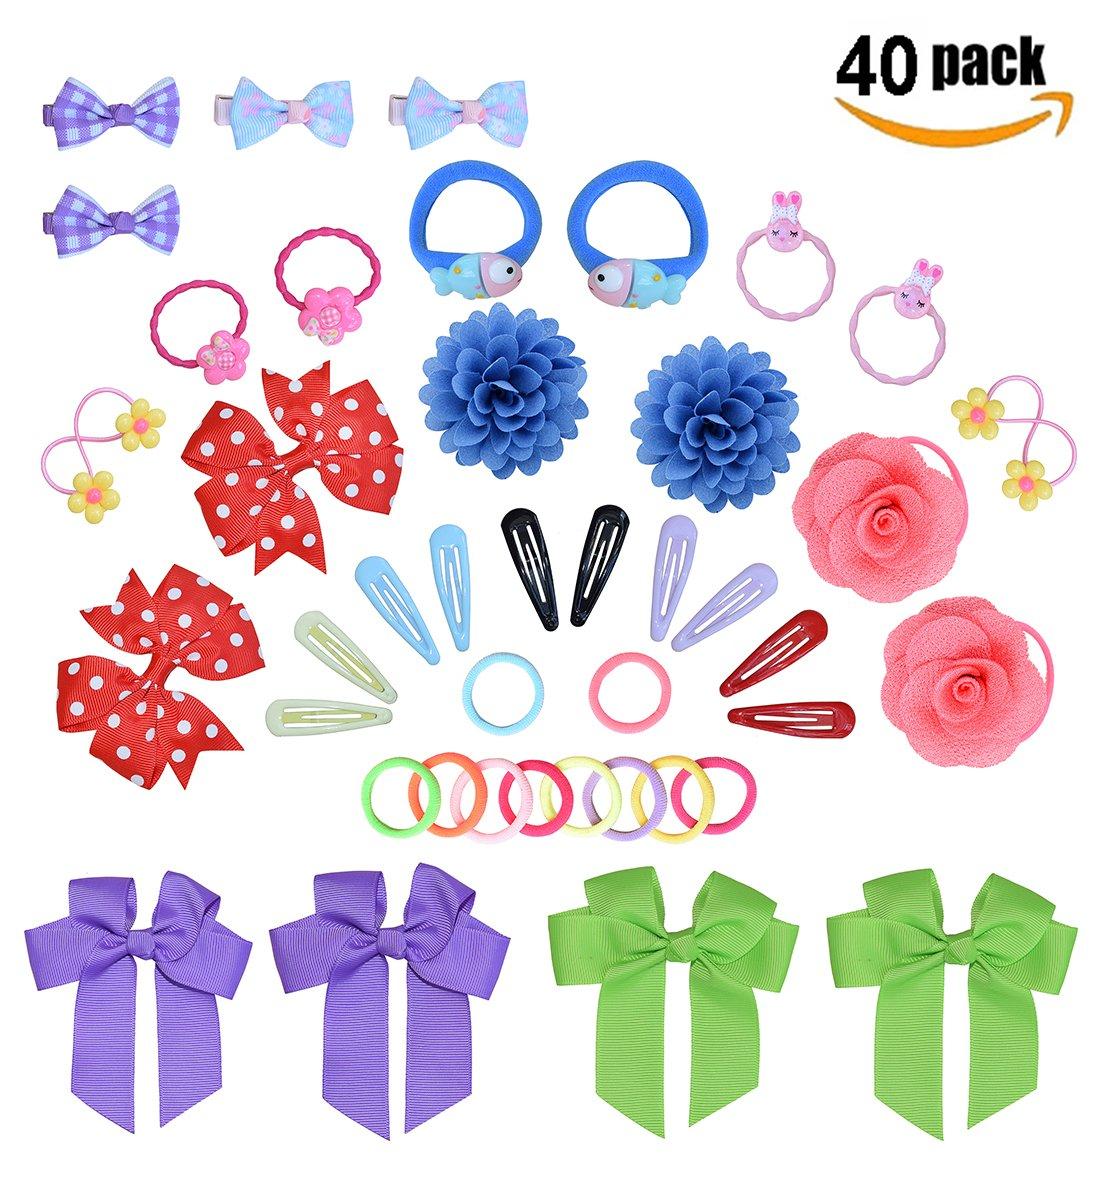 40PCS Girls Hair Accessories Set, 20Pcs Cute Elastic Hair Bands +20Pcs Princess Hair Clip For Girl's Birthday Christmas Gift-A